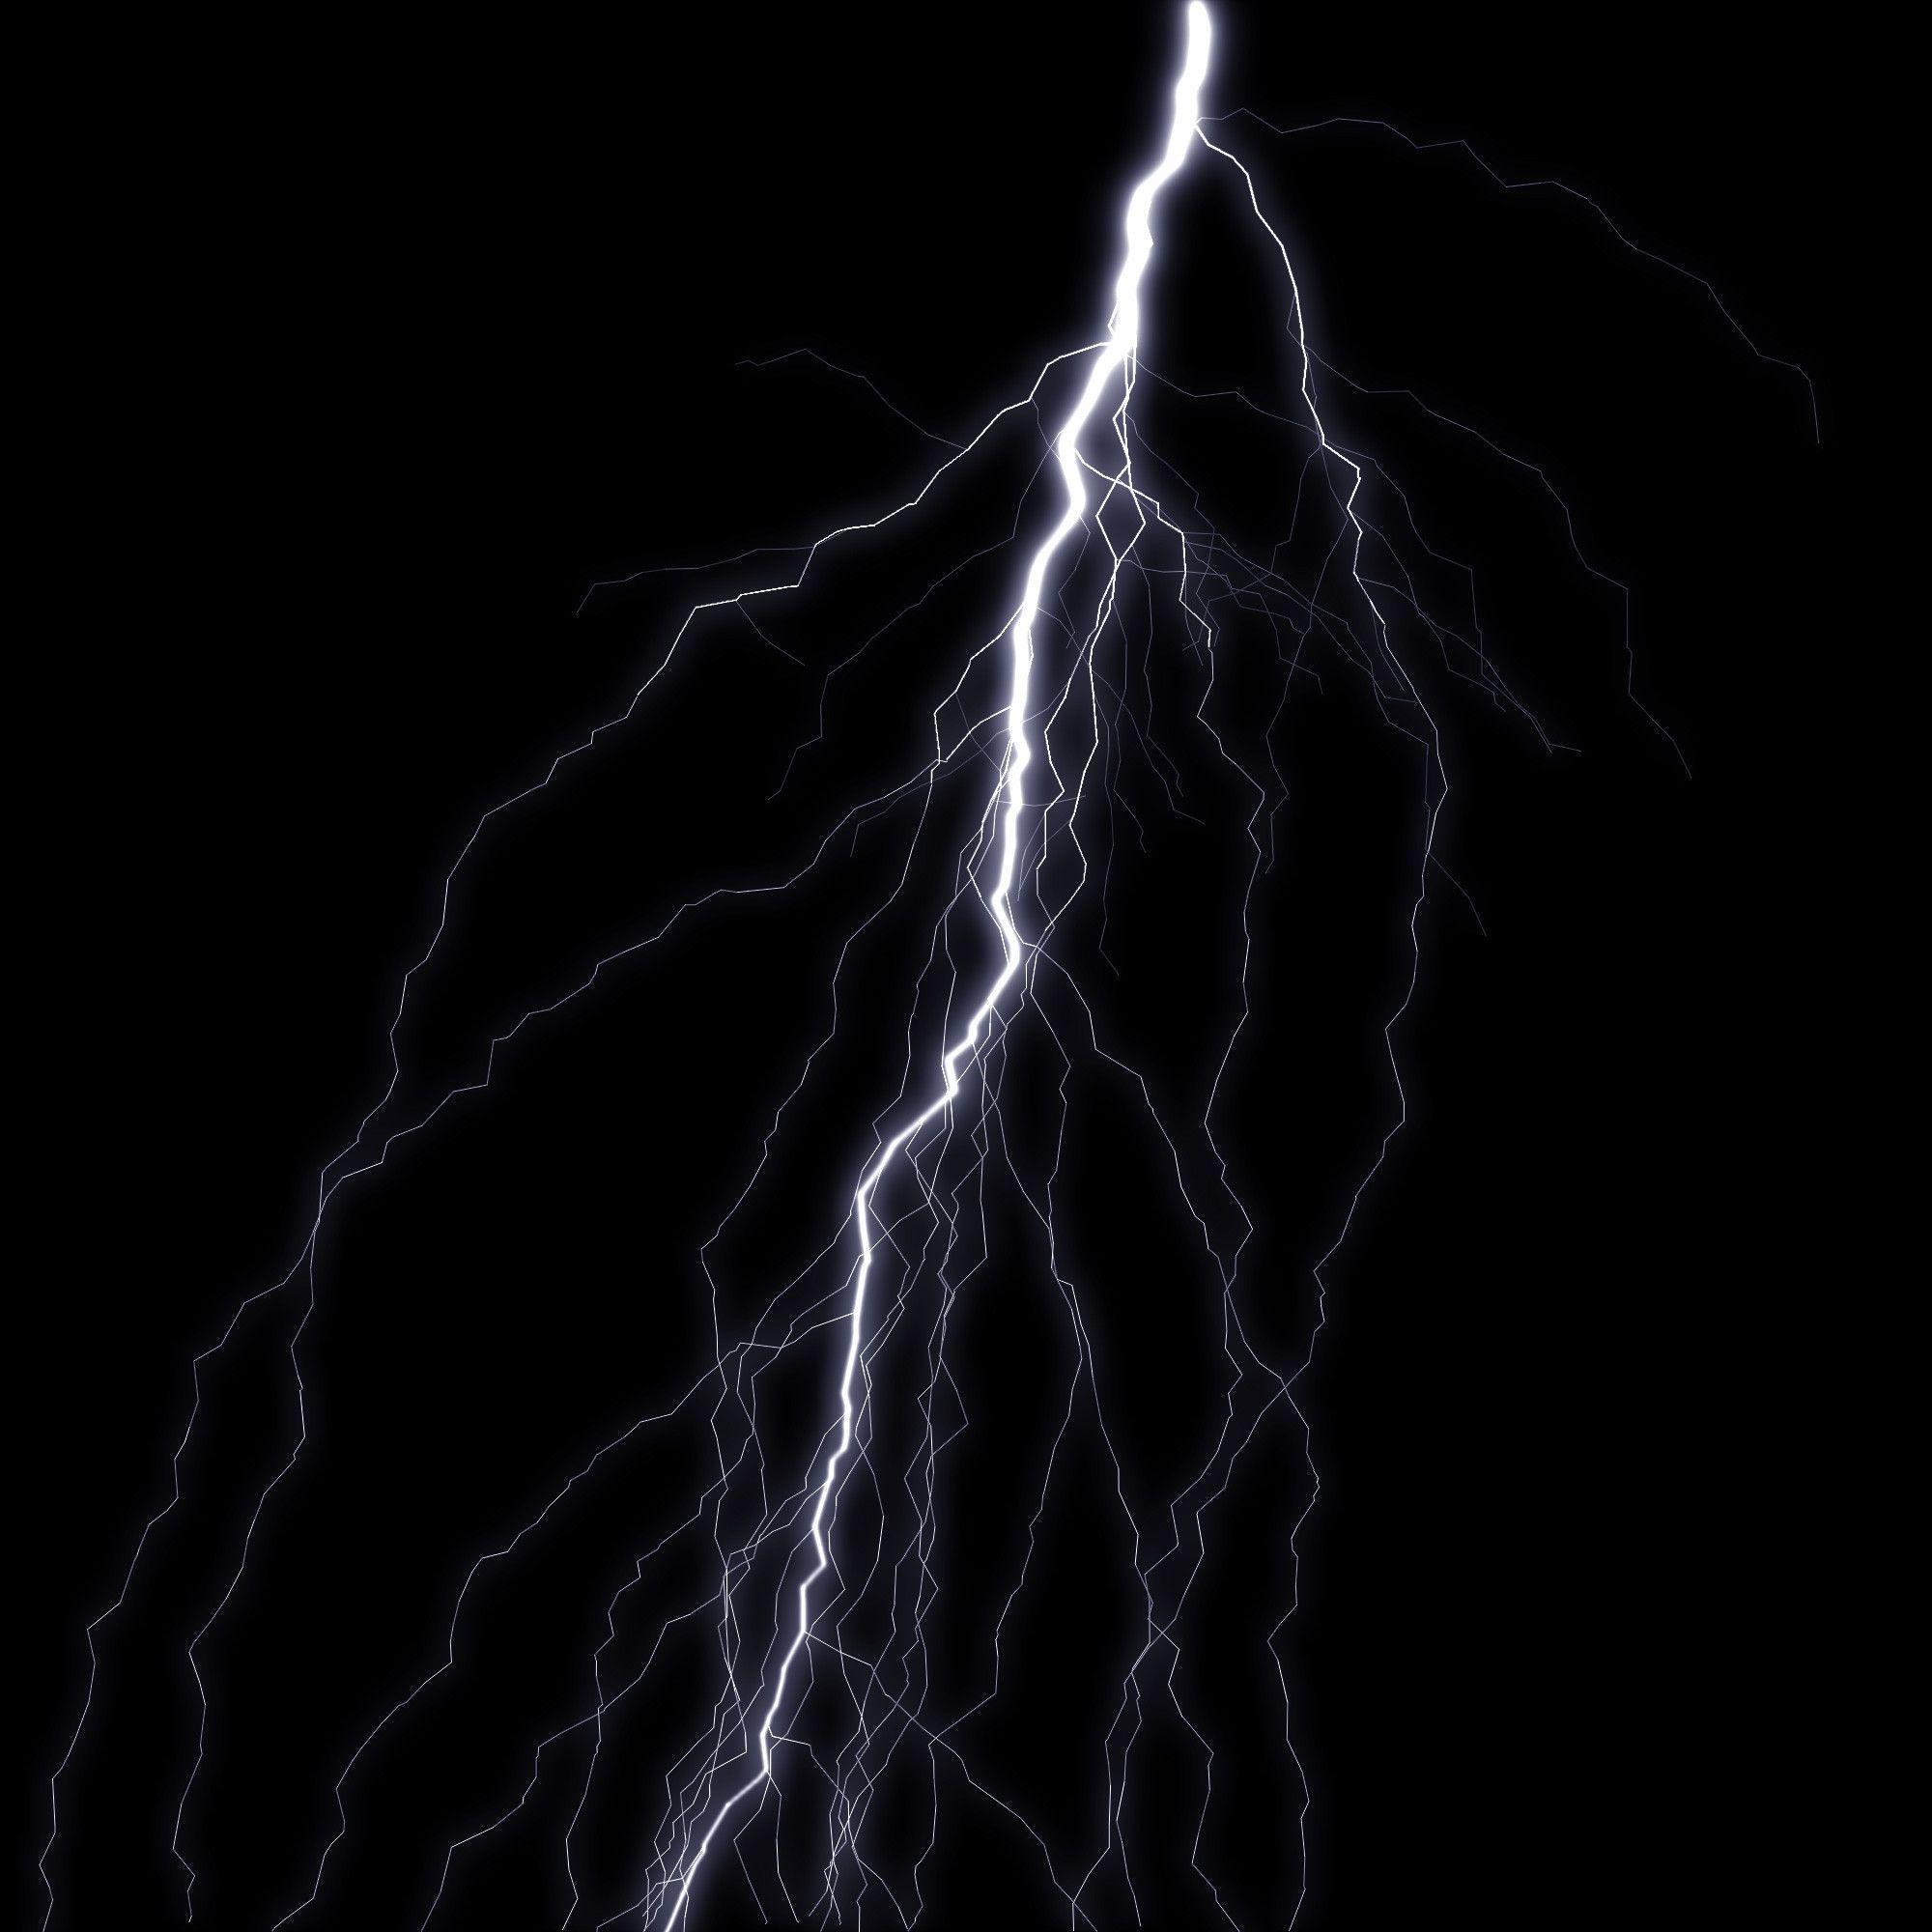 lightning black wallpaper - photo #12